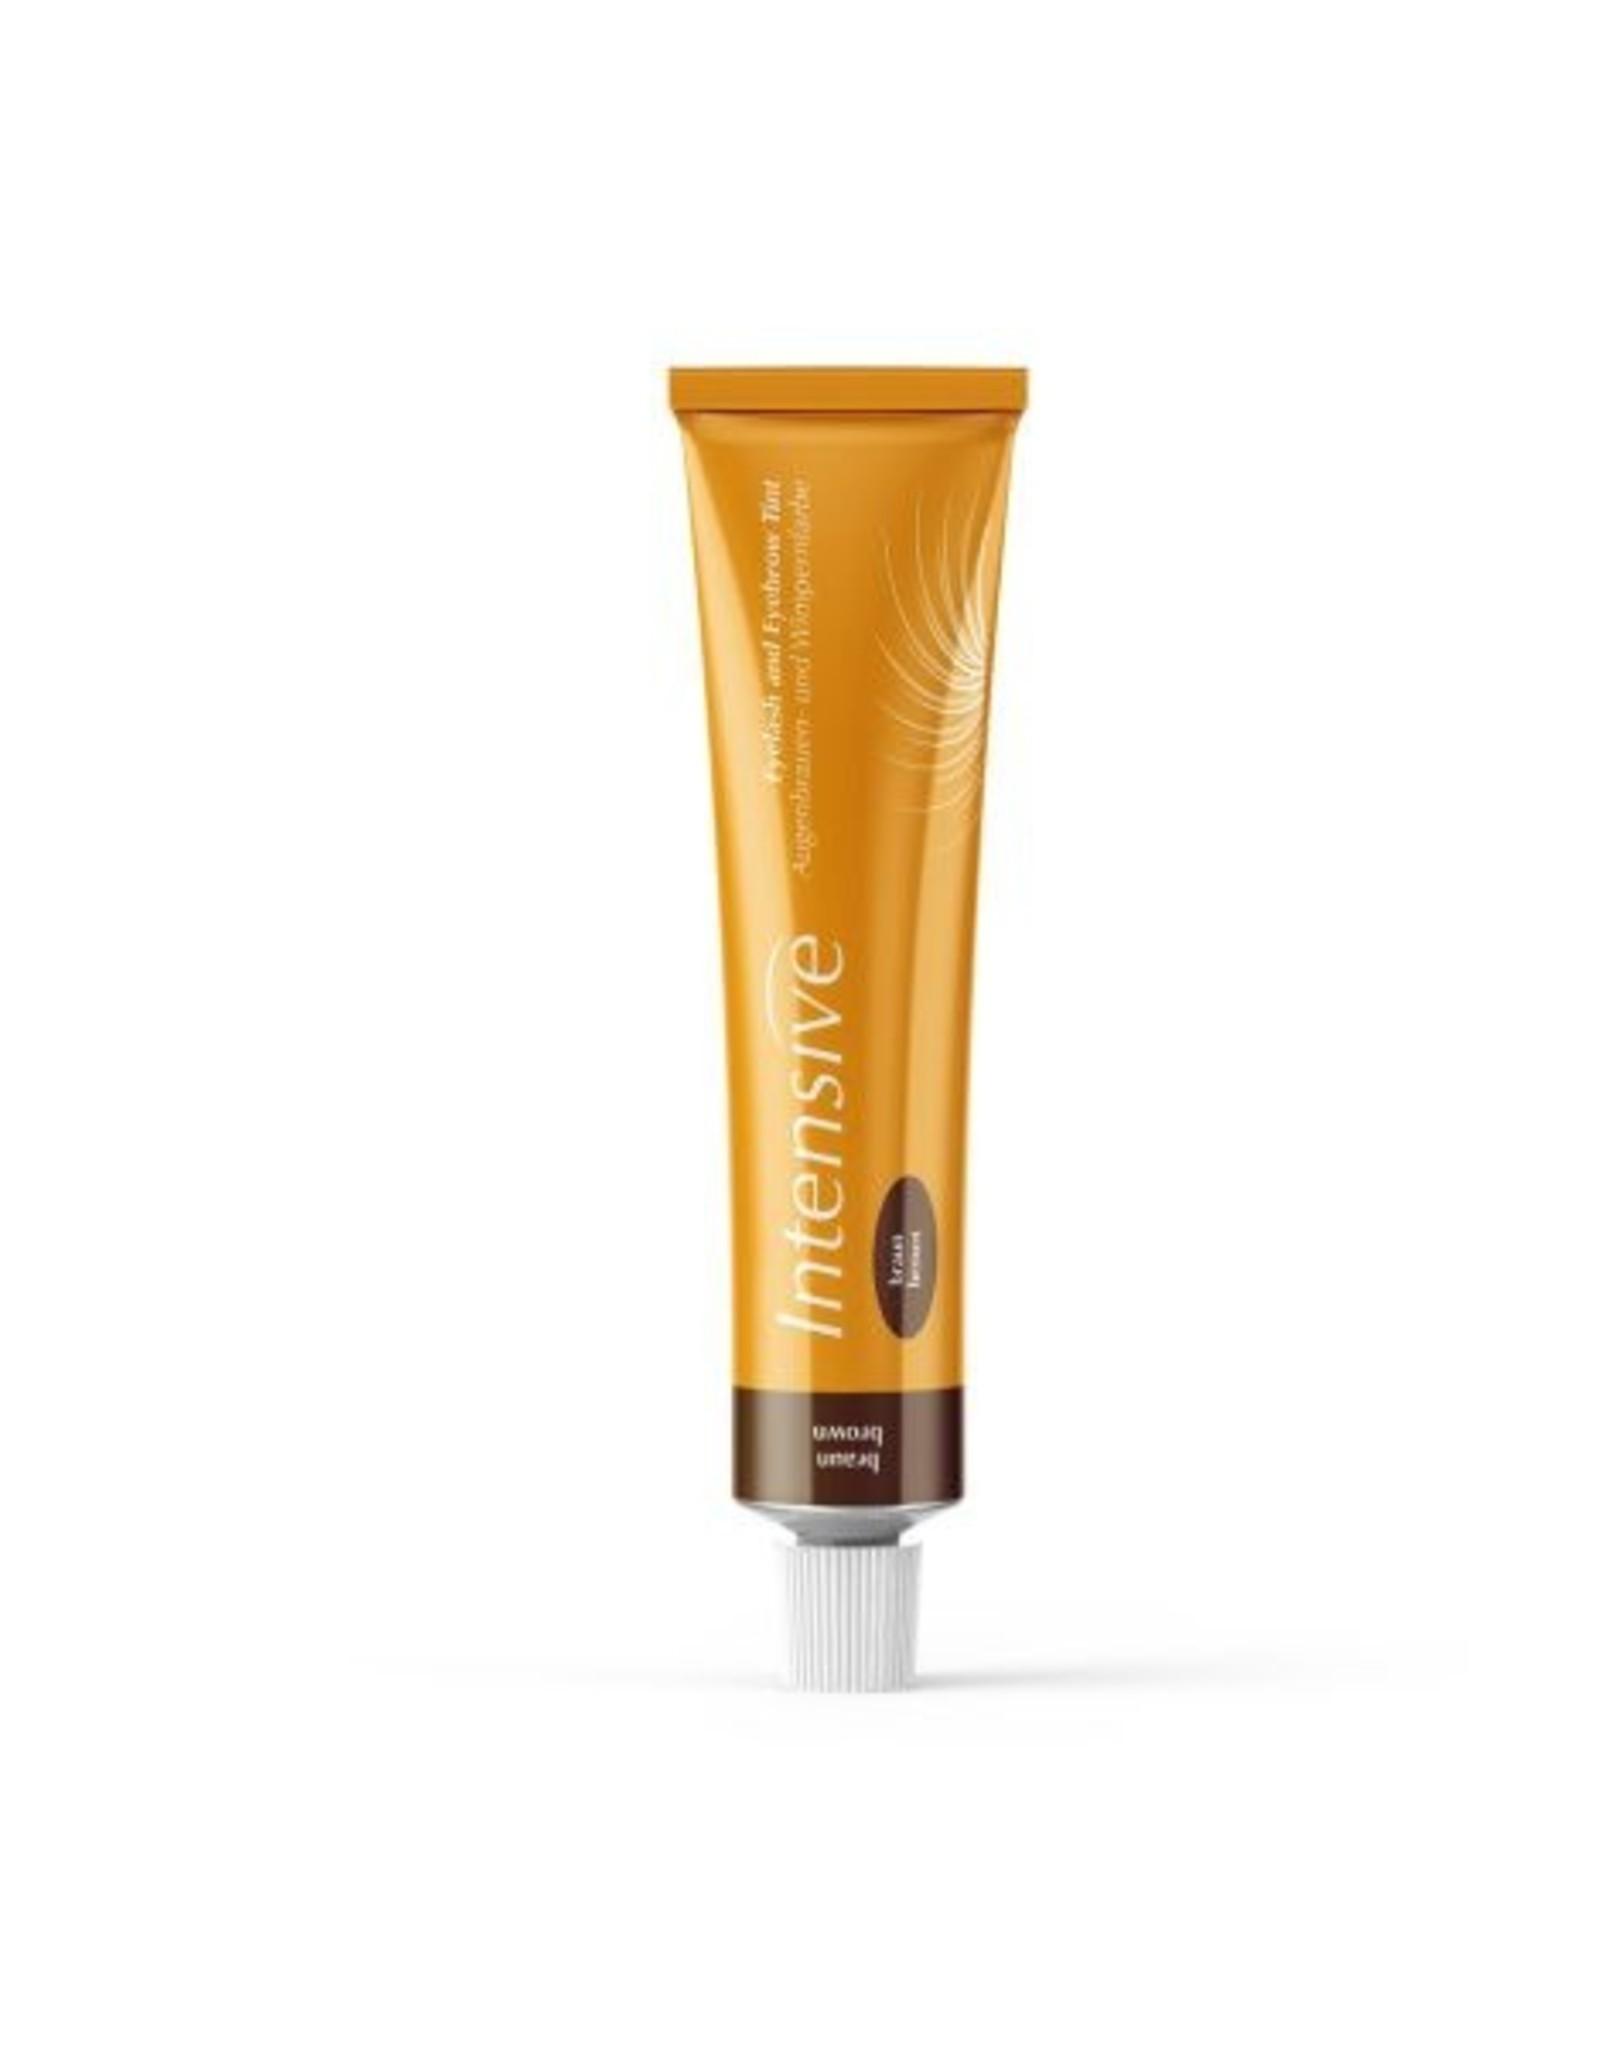 Eyelash and eyebrow dye from Biosmetics. - Tint Brown